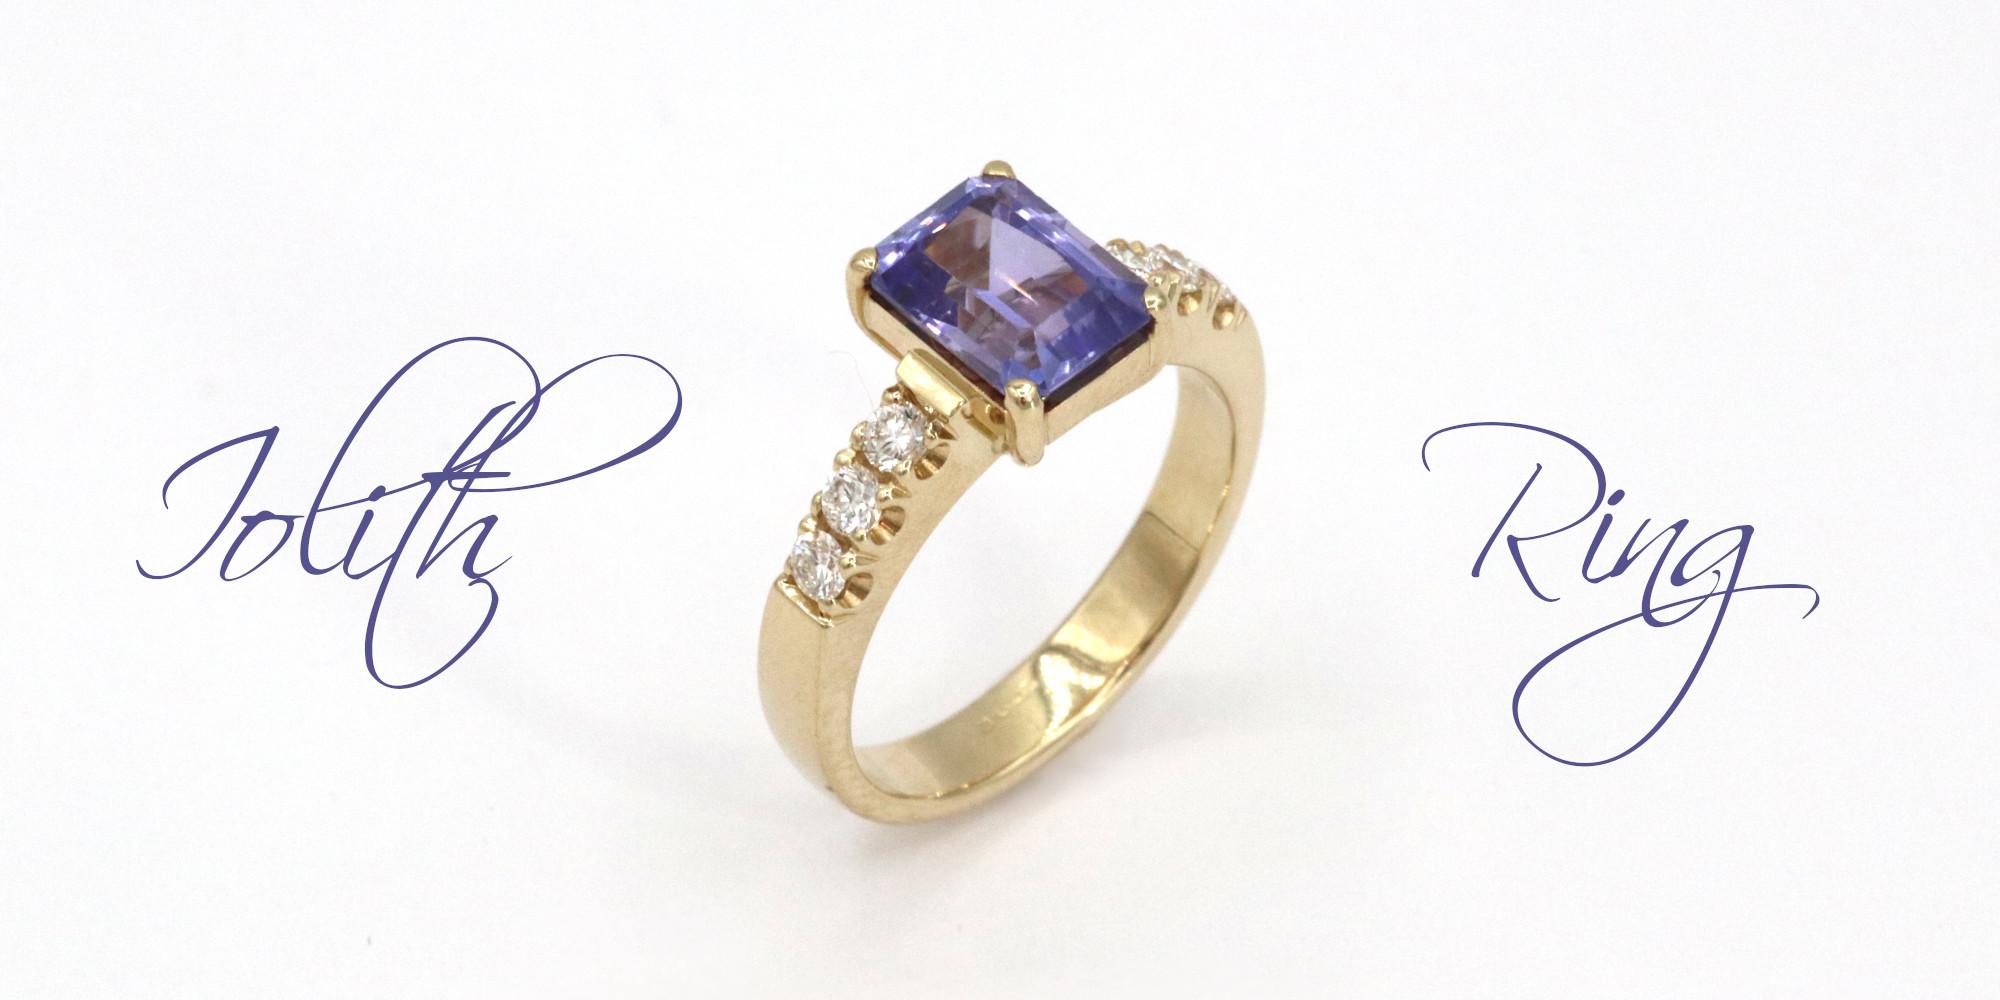 Iolit Ring Goldschmiede Mace